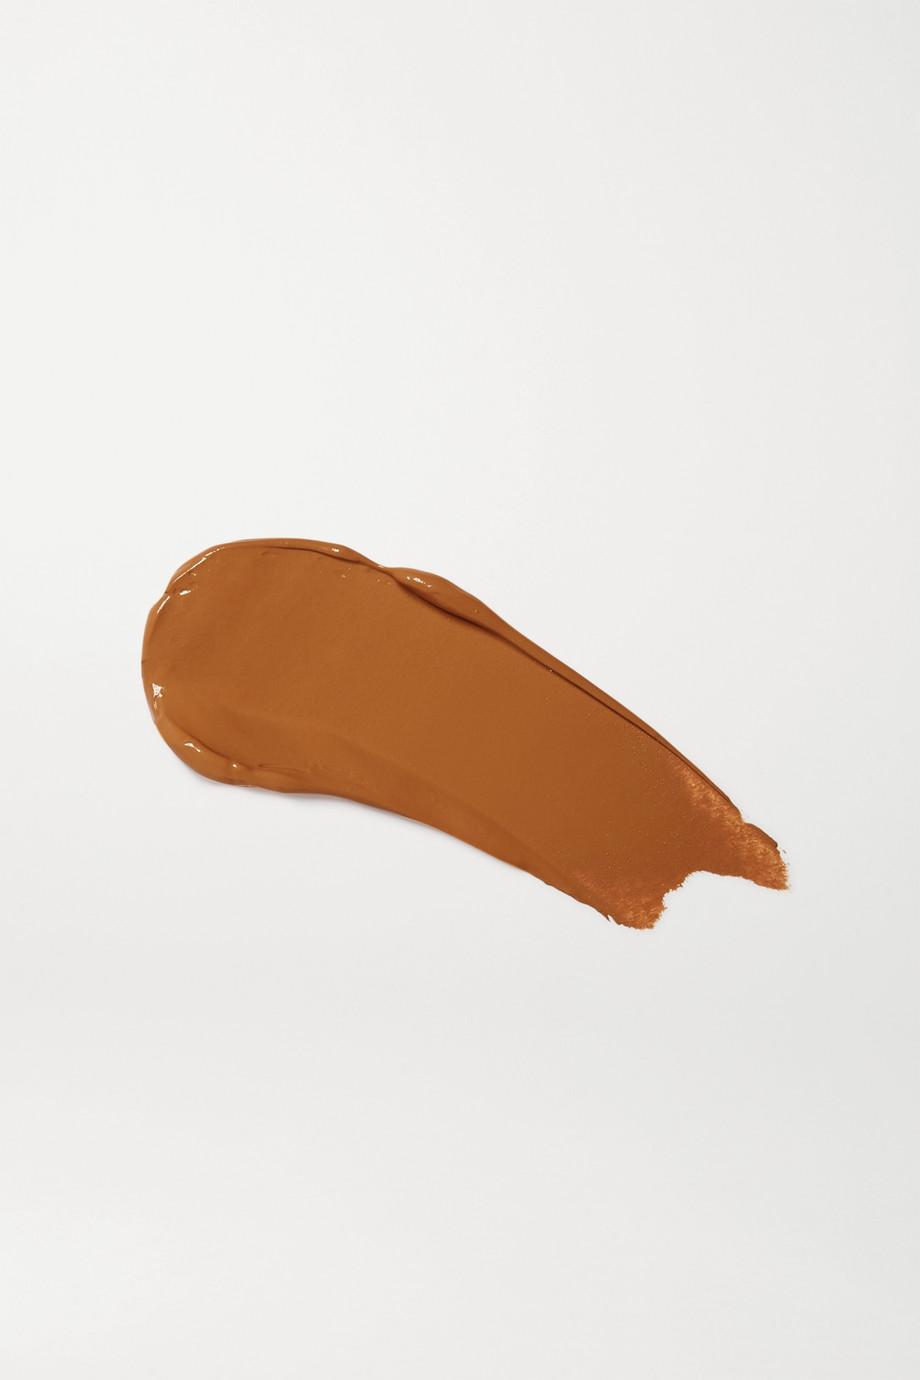 NARS Correcteur crémeux Radiant, Walnut, 6 ml